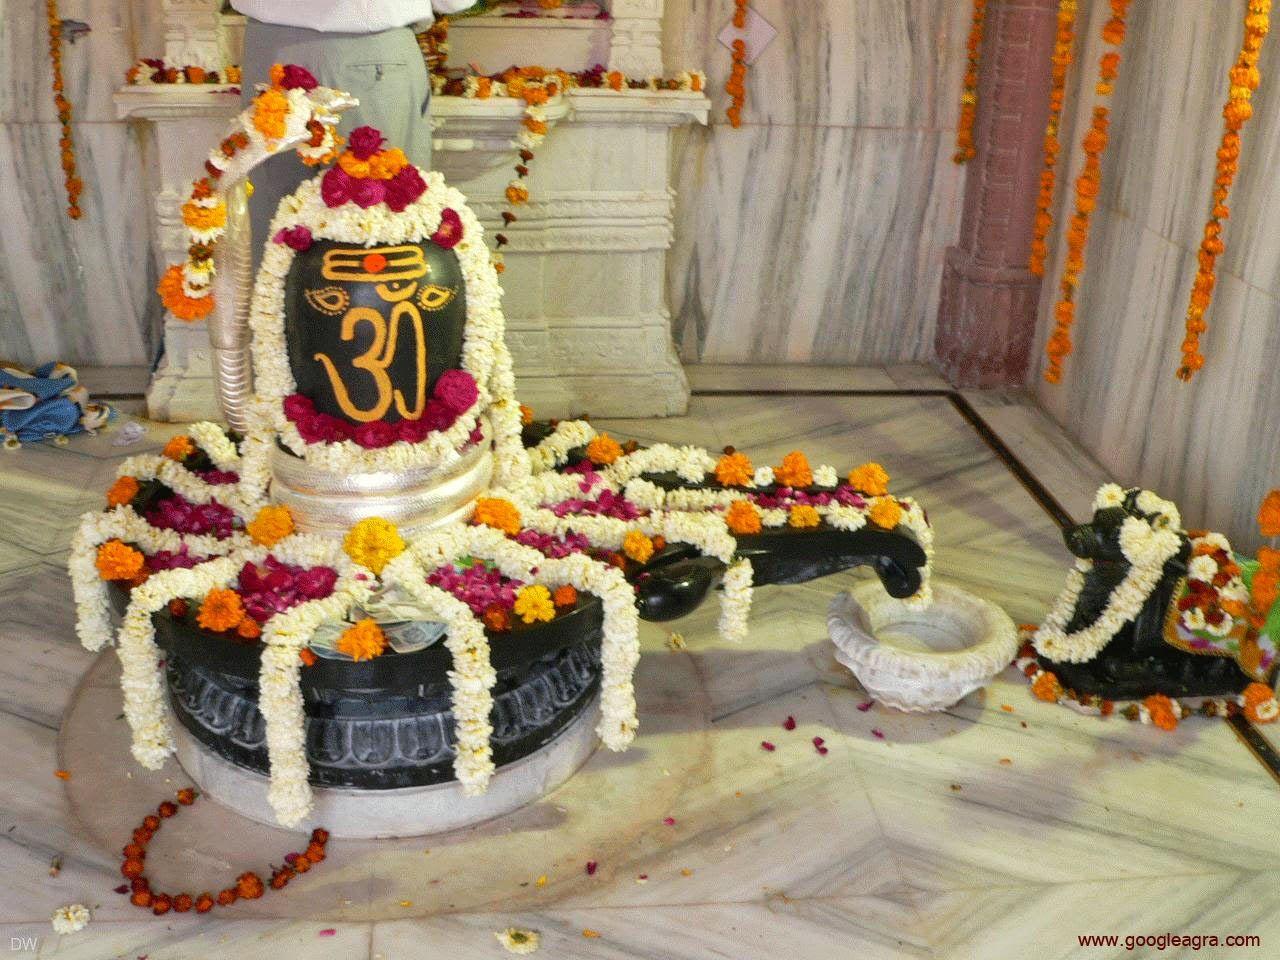 Shivling www.googleagra.com | Lord shiva, Maha shivaratri wishes, Shiva